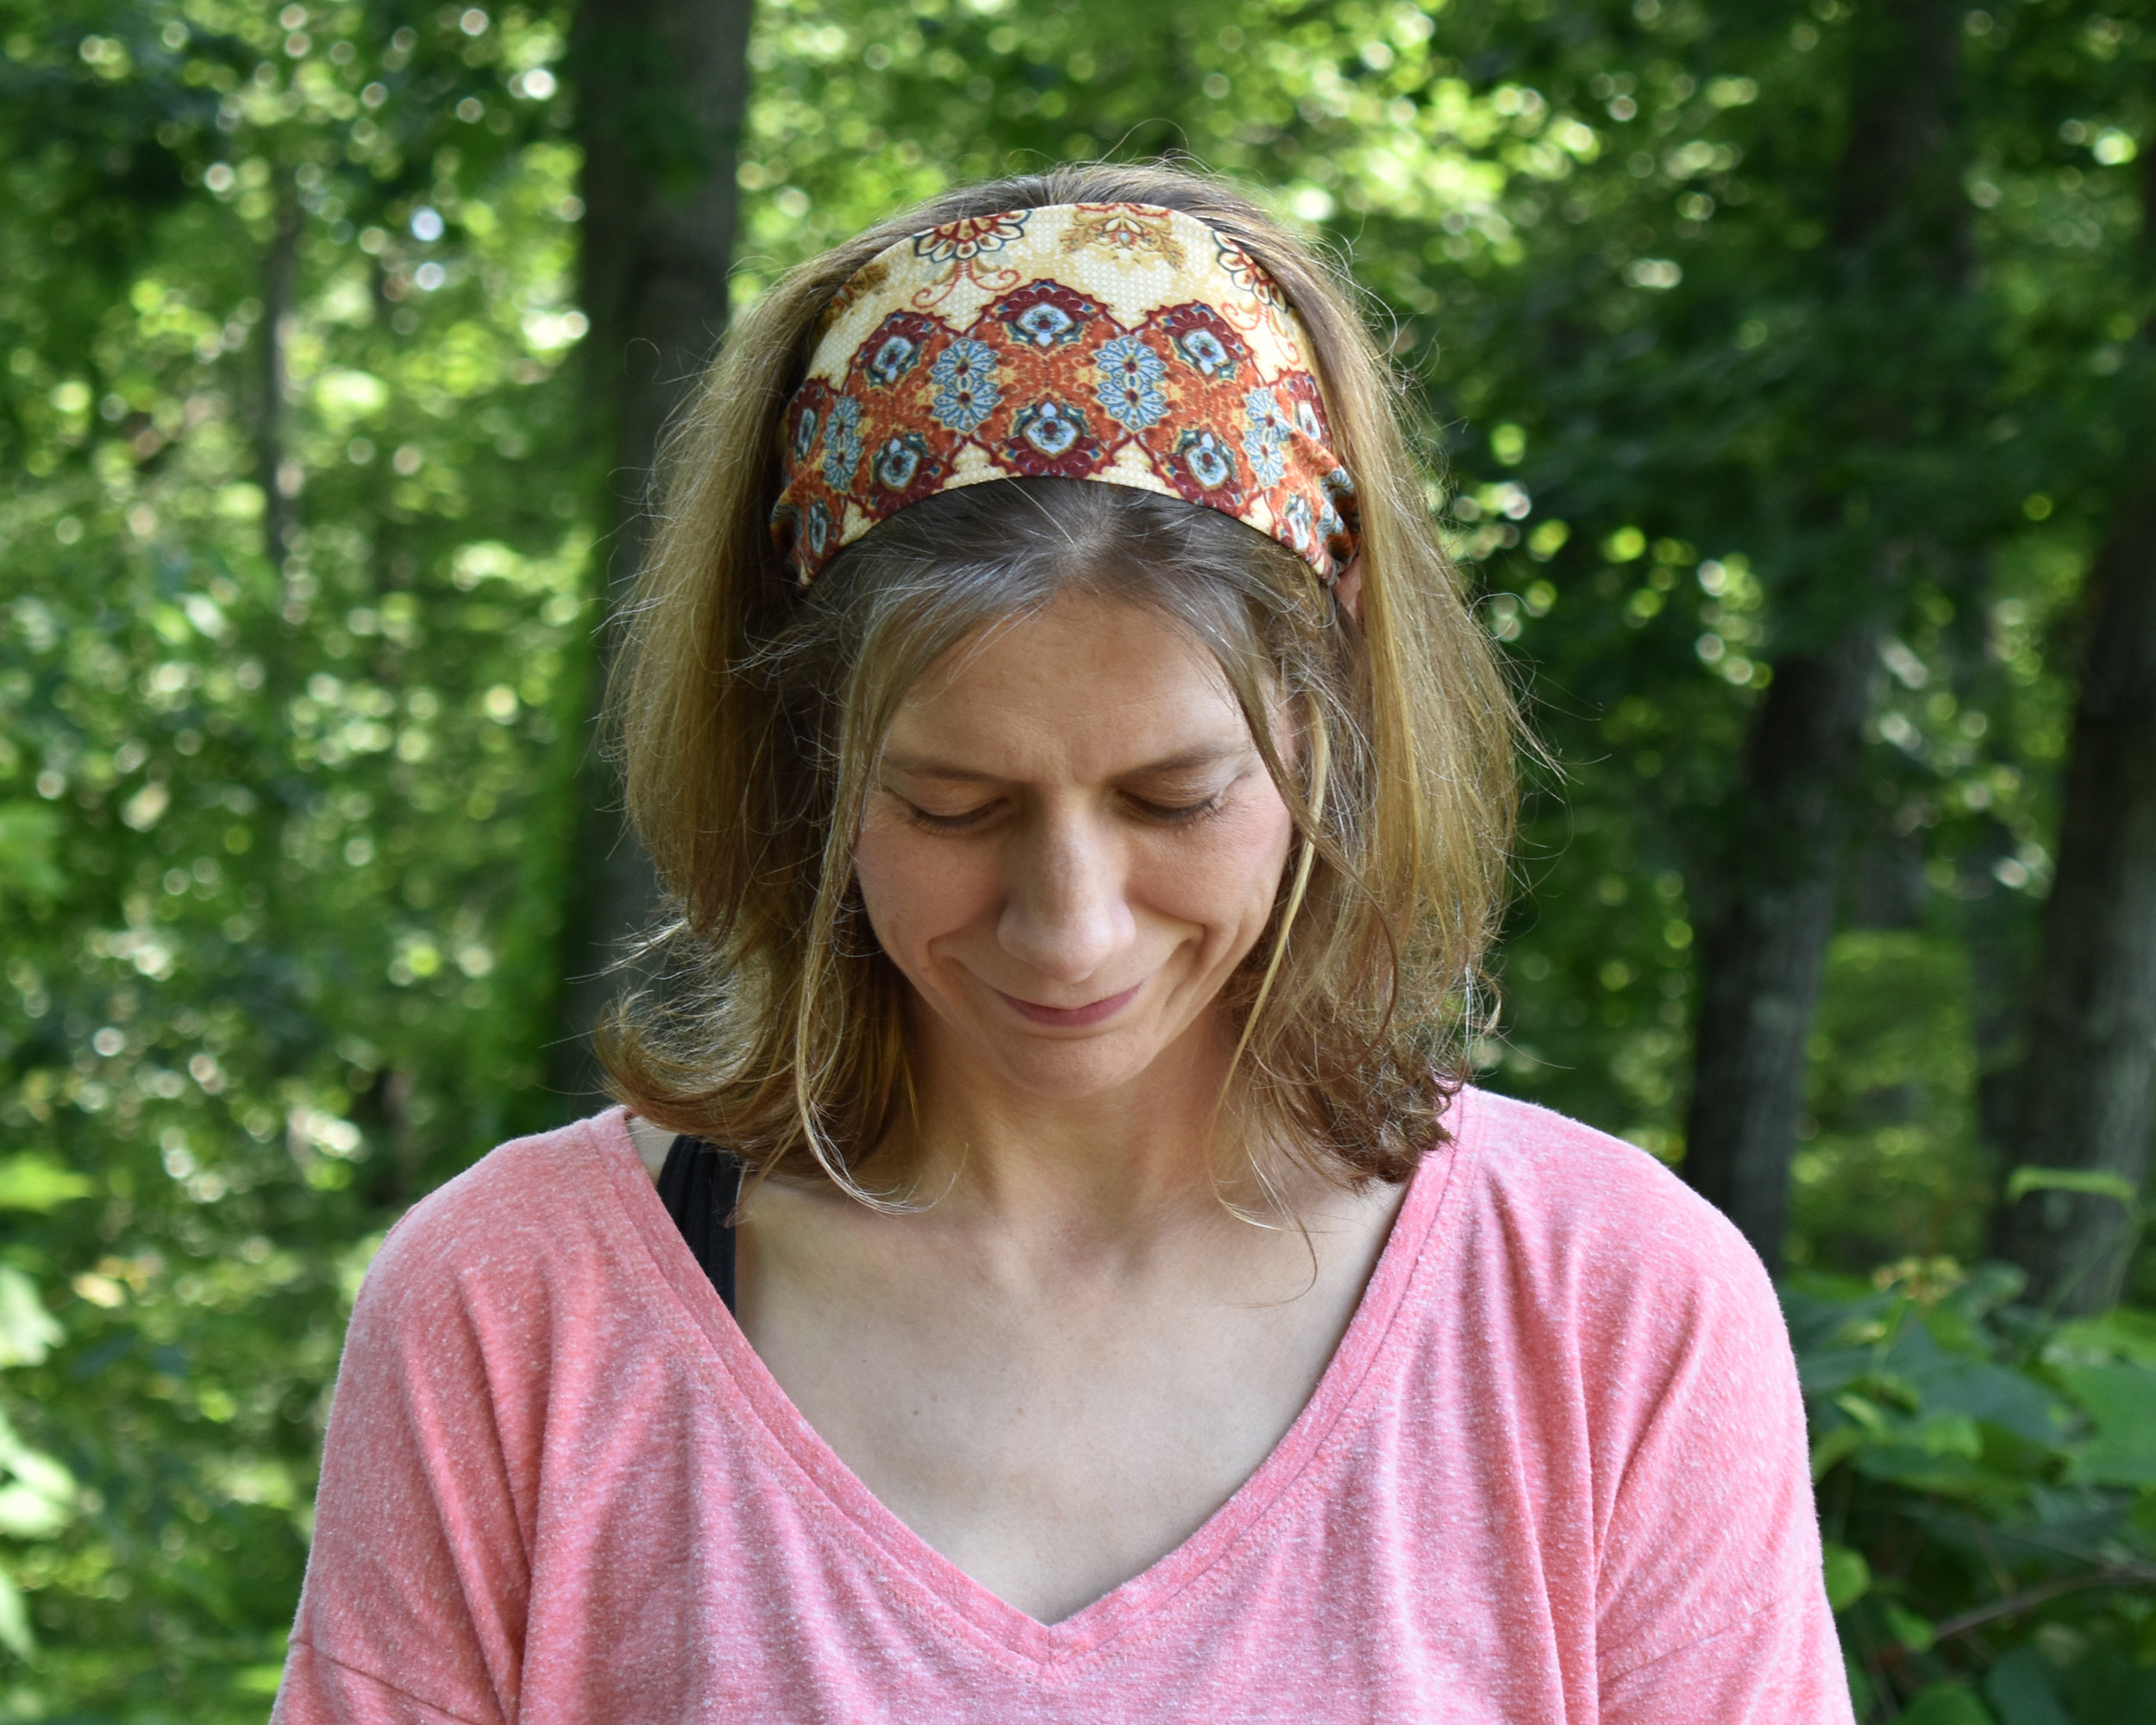 bohemian-headband.JPG